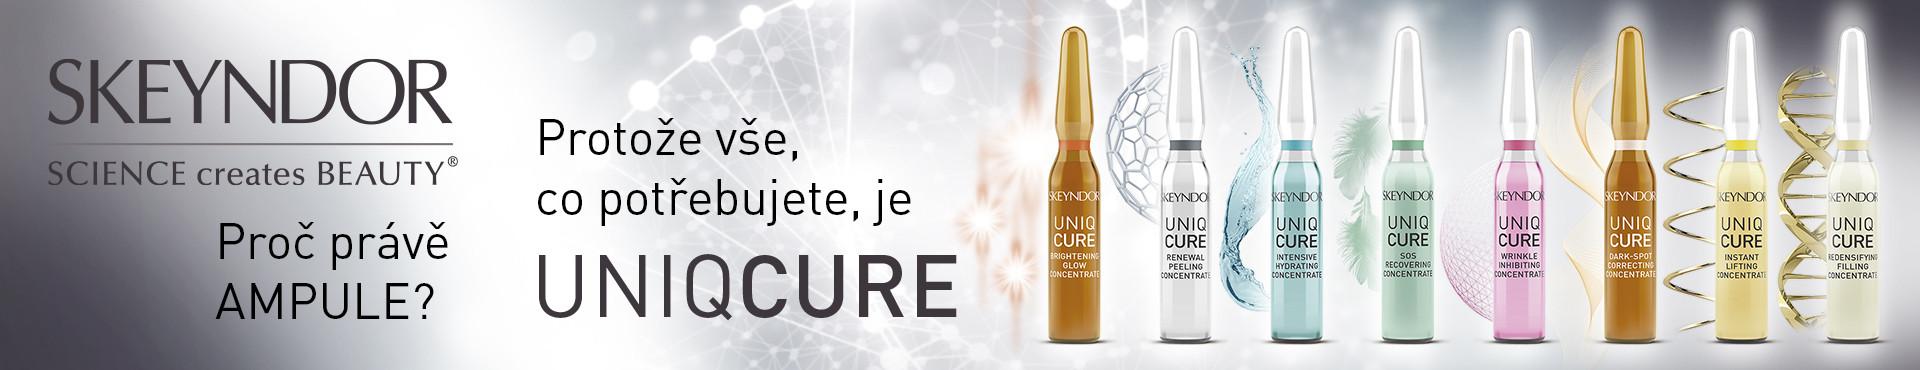 Uniqcure